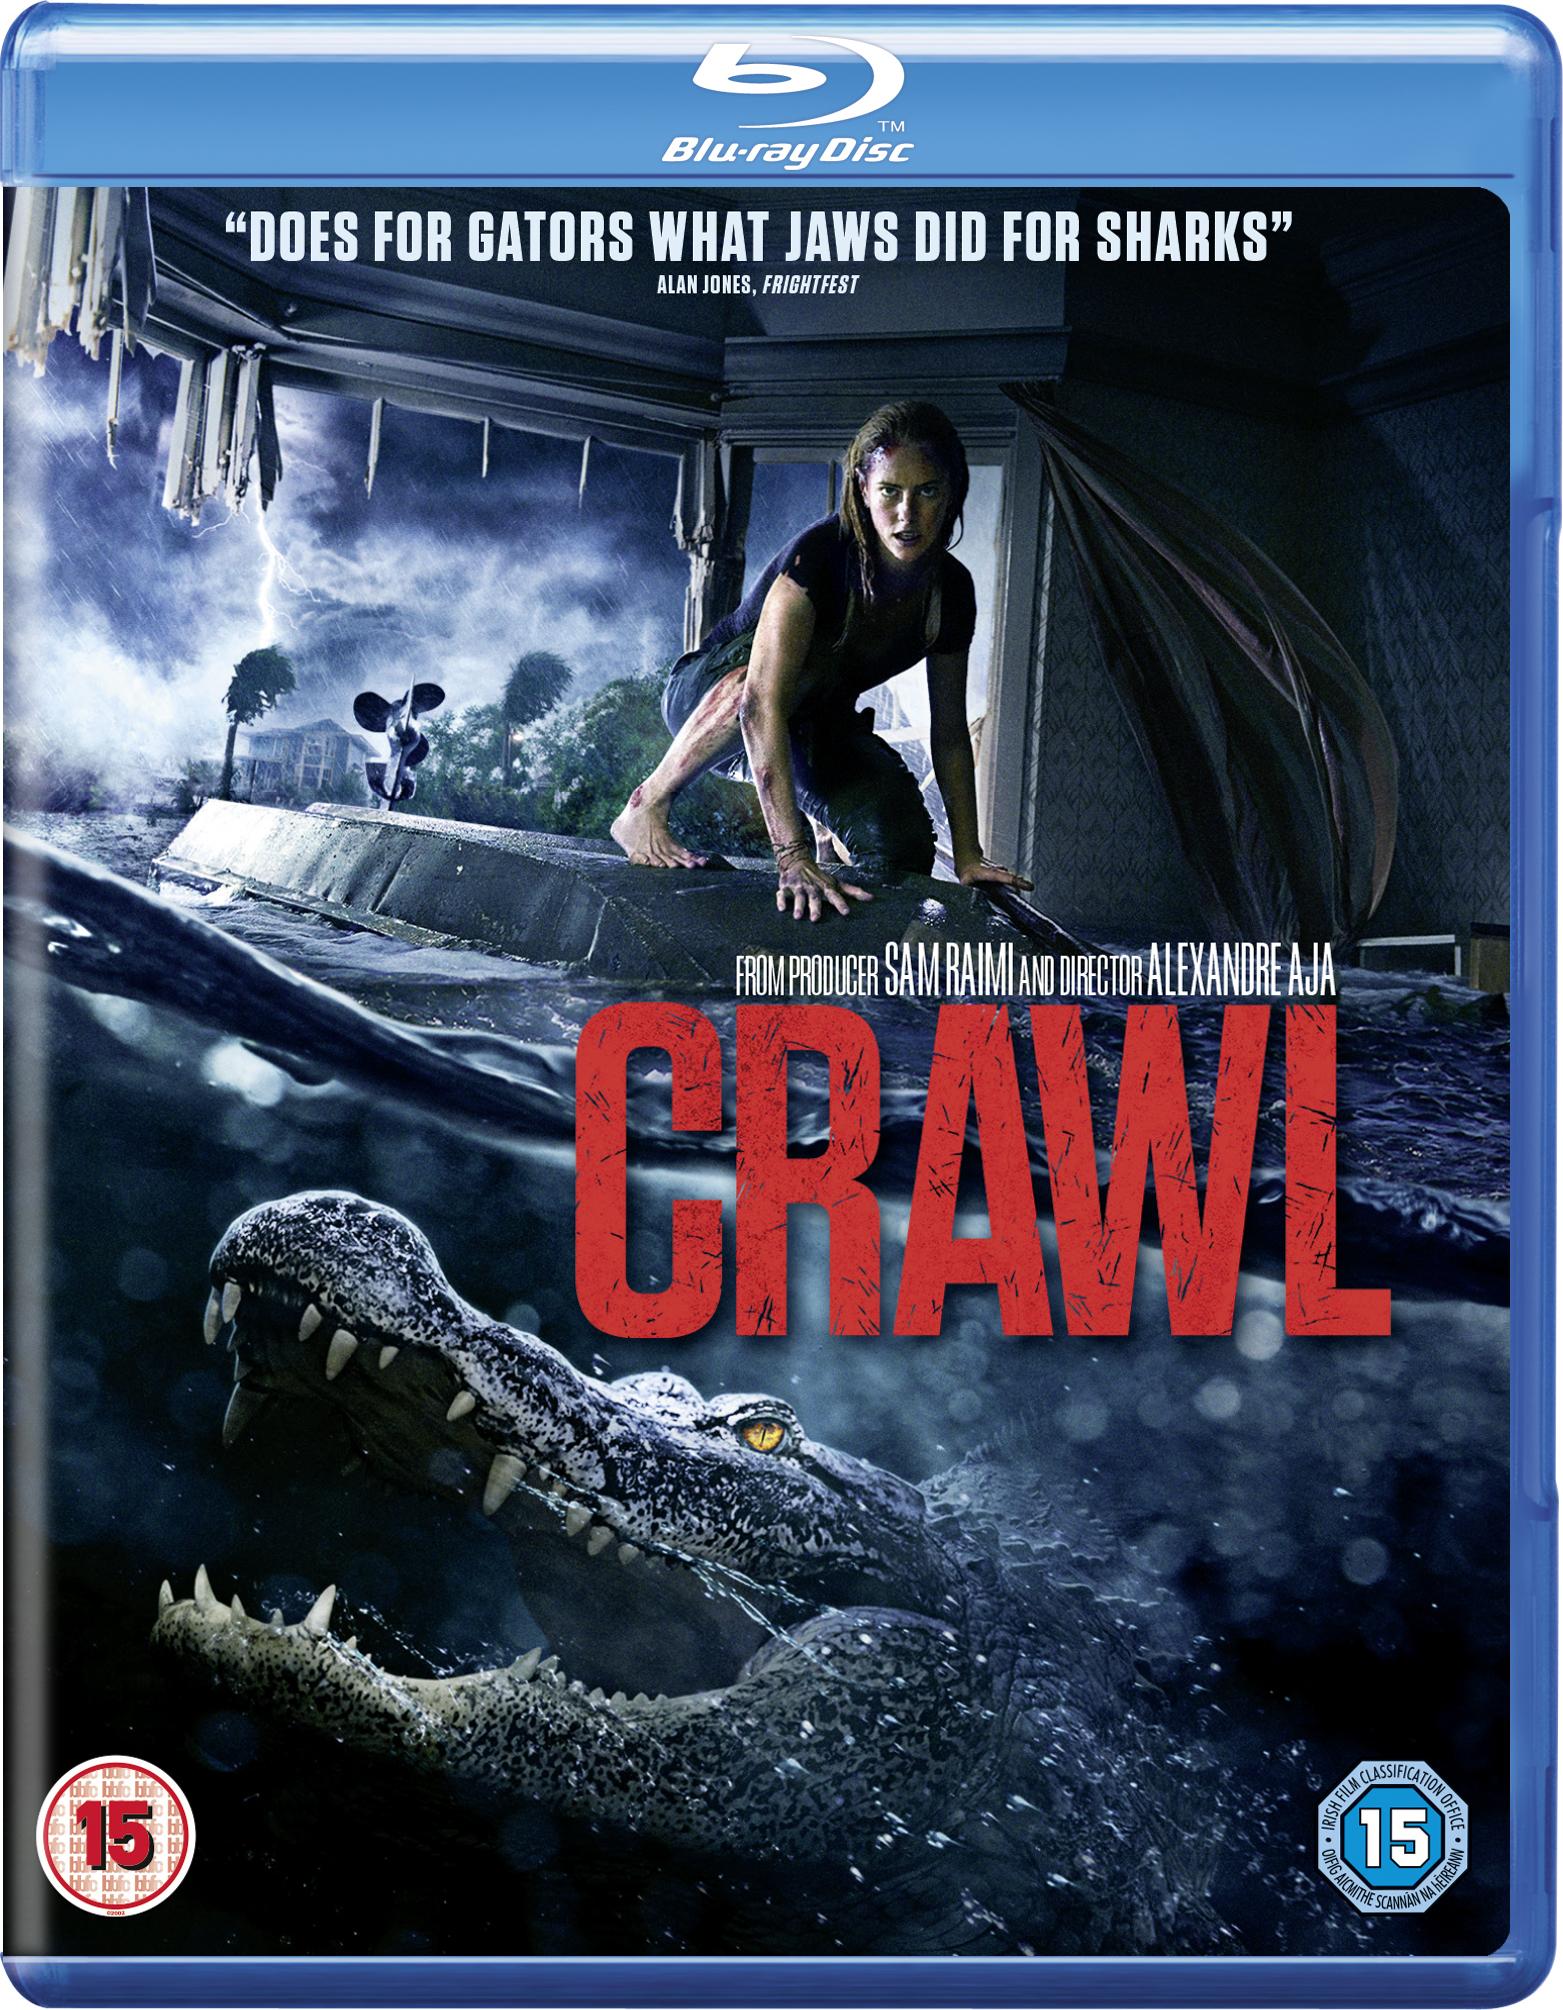 Crawl (2019) Dual Audio Hindi 480p BluRay ORG x264 AAC ESubs 300MB